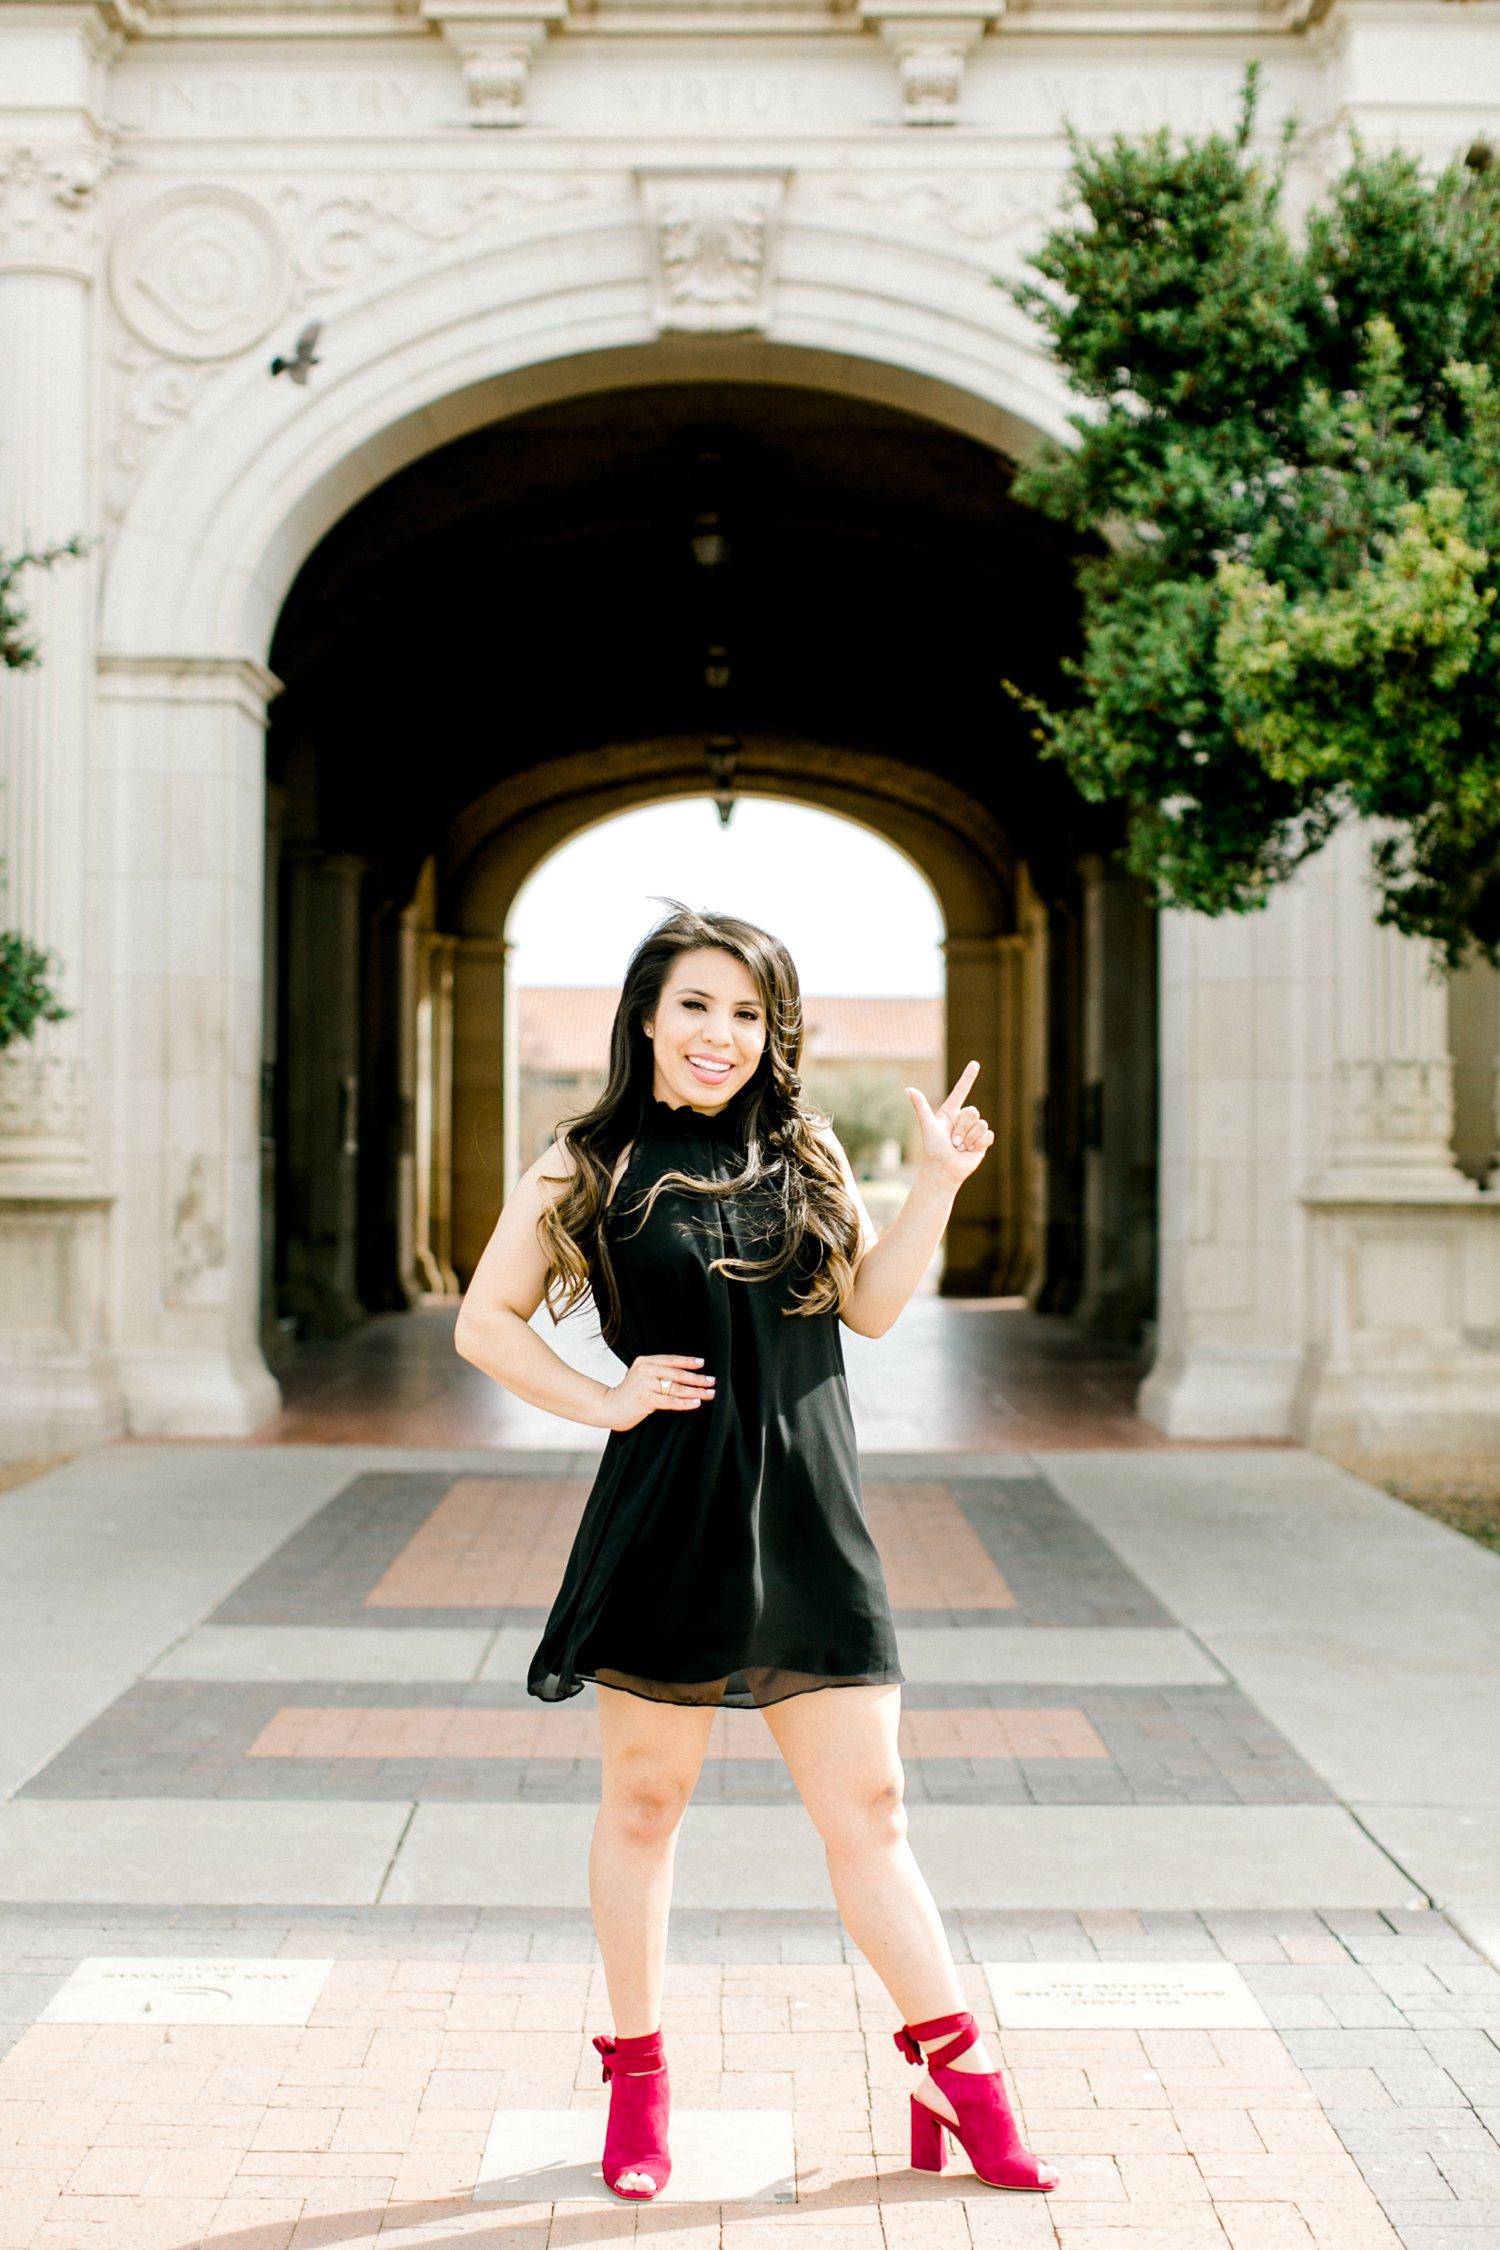 Desirae-morales-texas-tech-university-senior-photography_0018.jpg